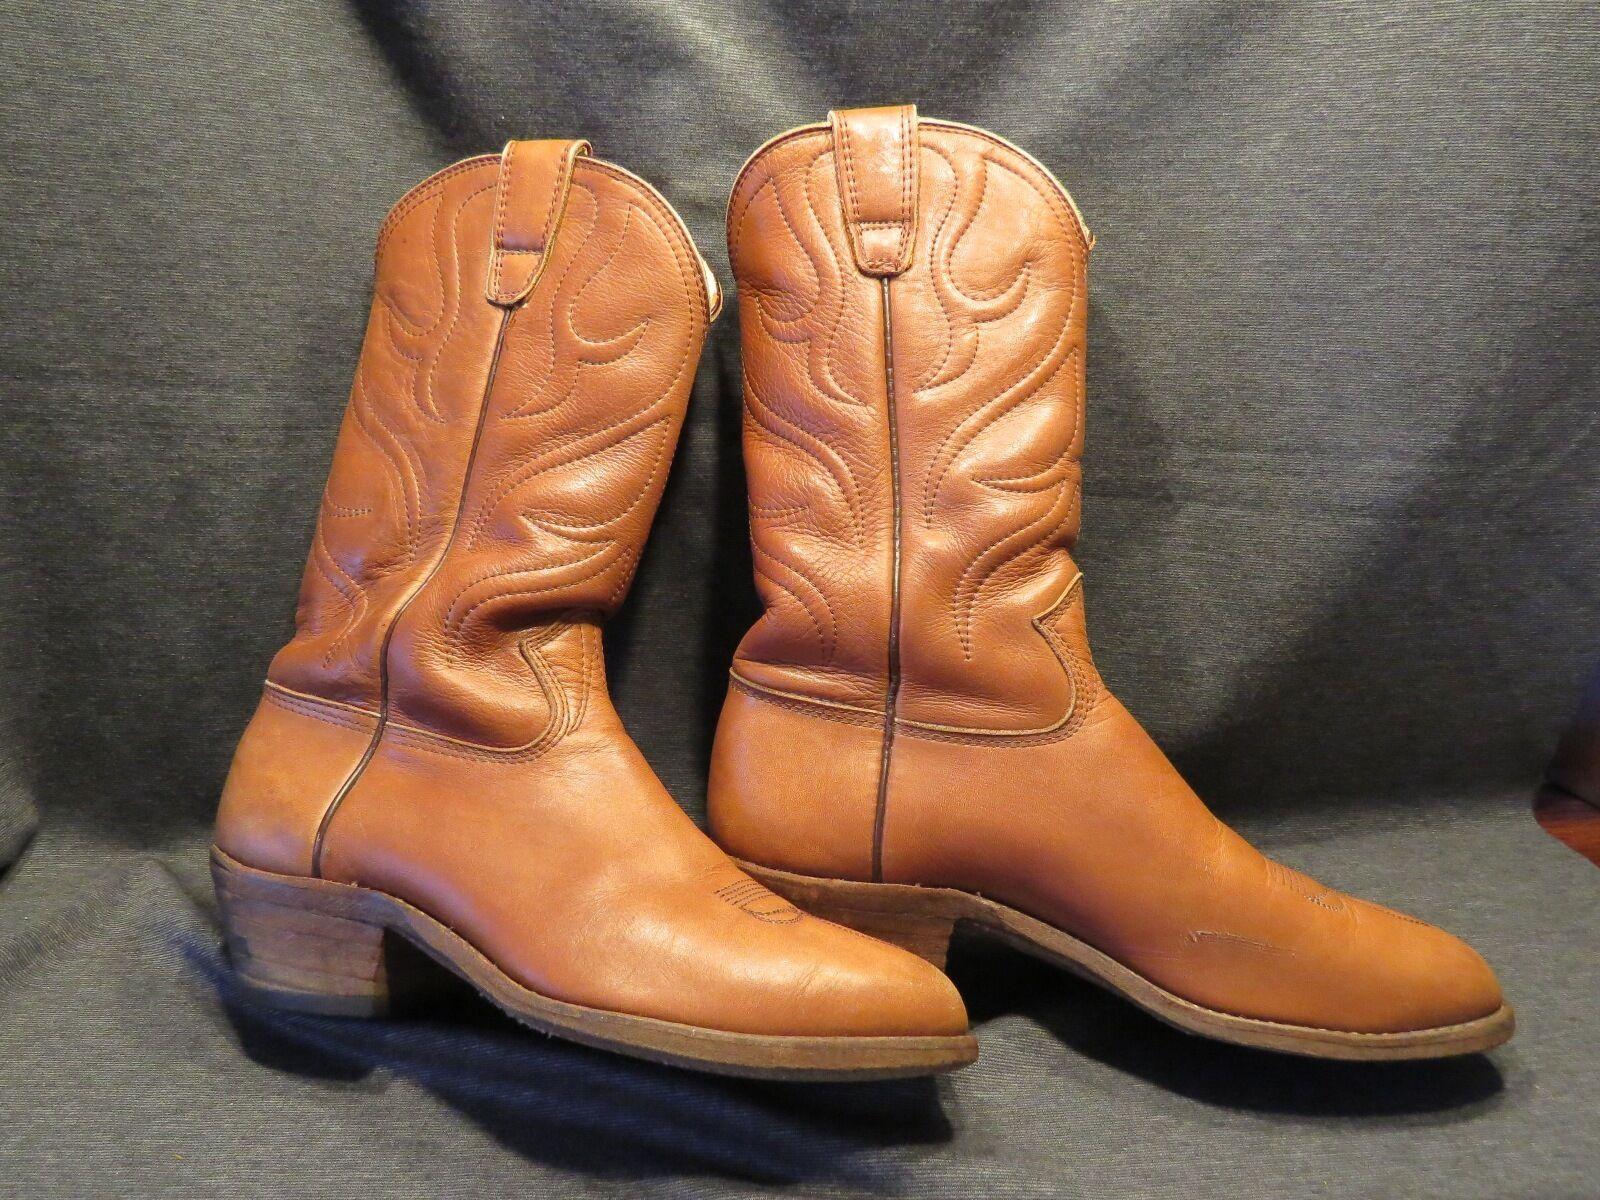 Stewart Cowboy Boots Co Hand Made Vintage 1977 Western Boots Sz 8 1 2 D Carmel